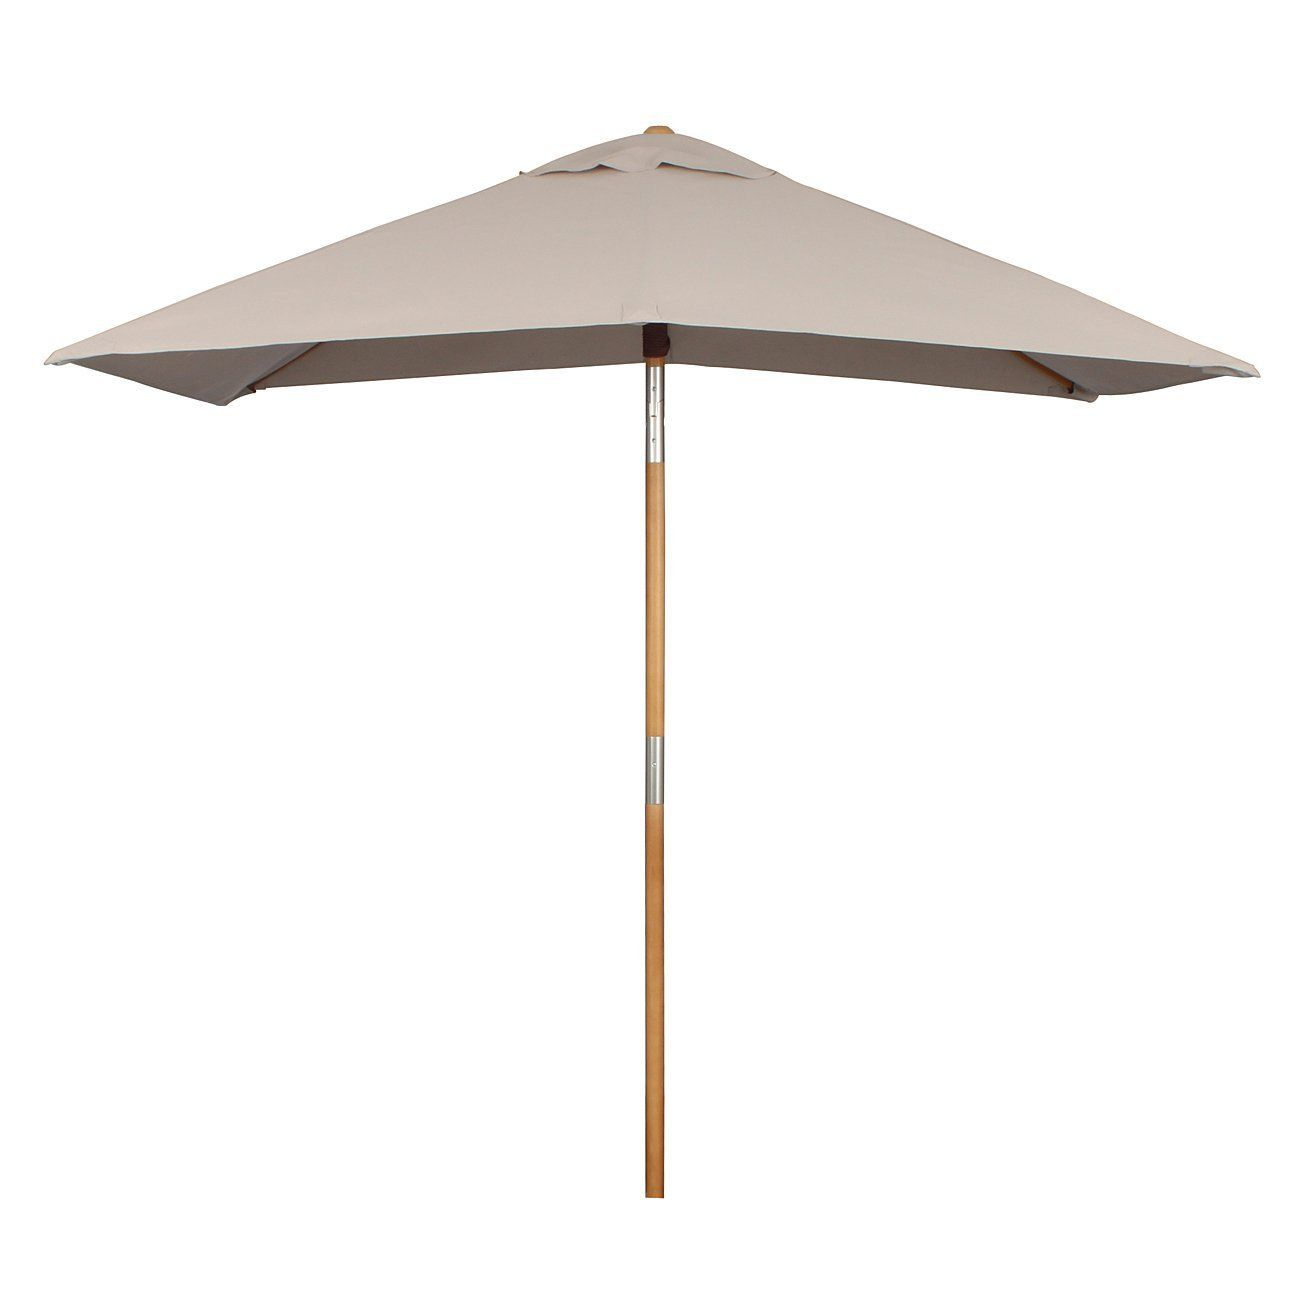 parasol deporte inclinable simple parasol d cm sable acier et polyester with parasol deporte. Black Bedroom Furniture Sets. Home Design Ideas